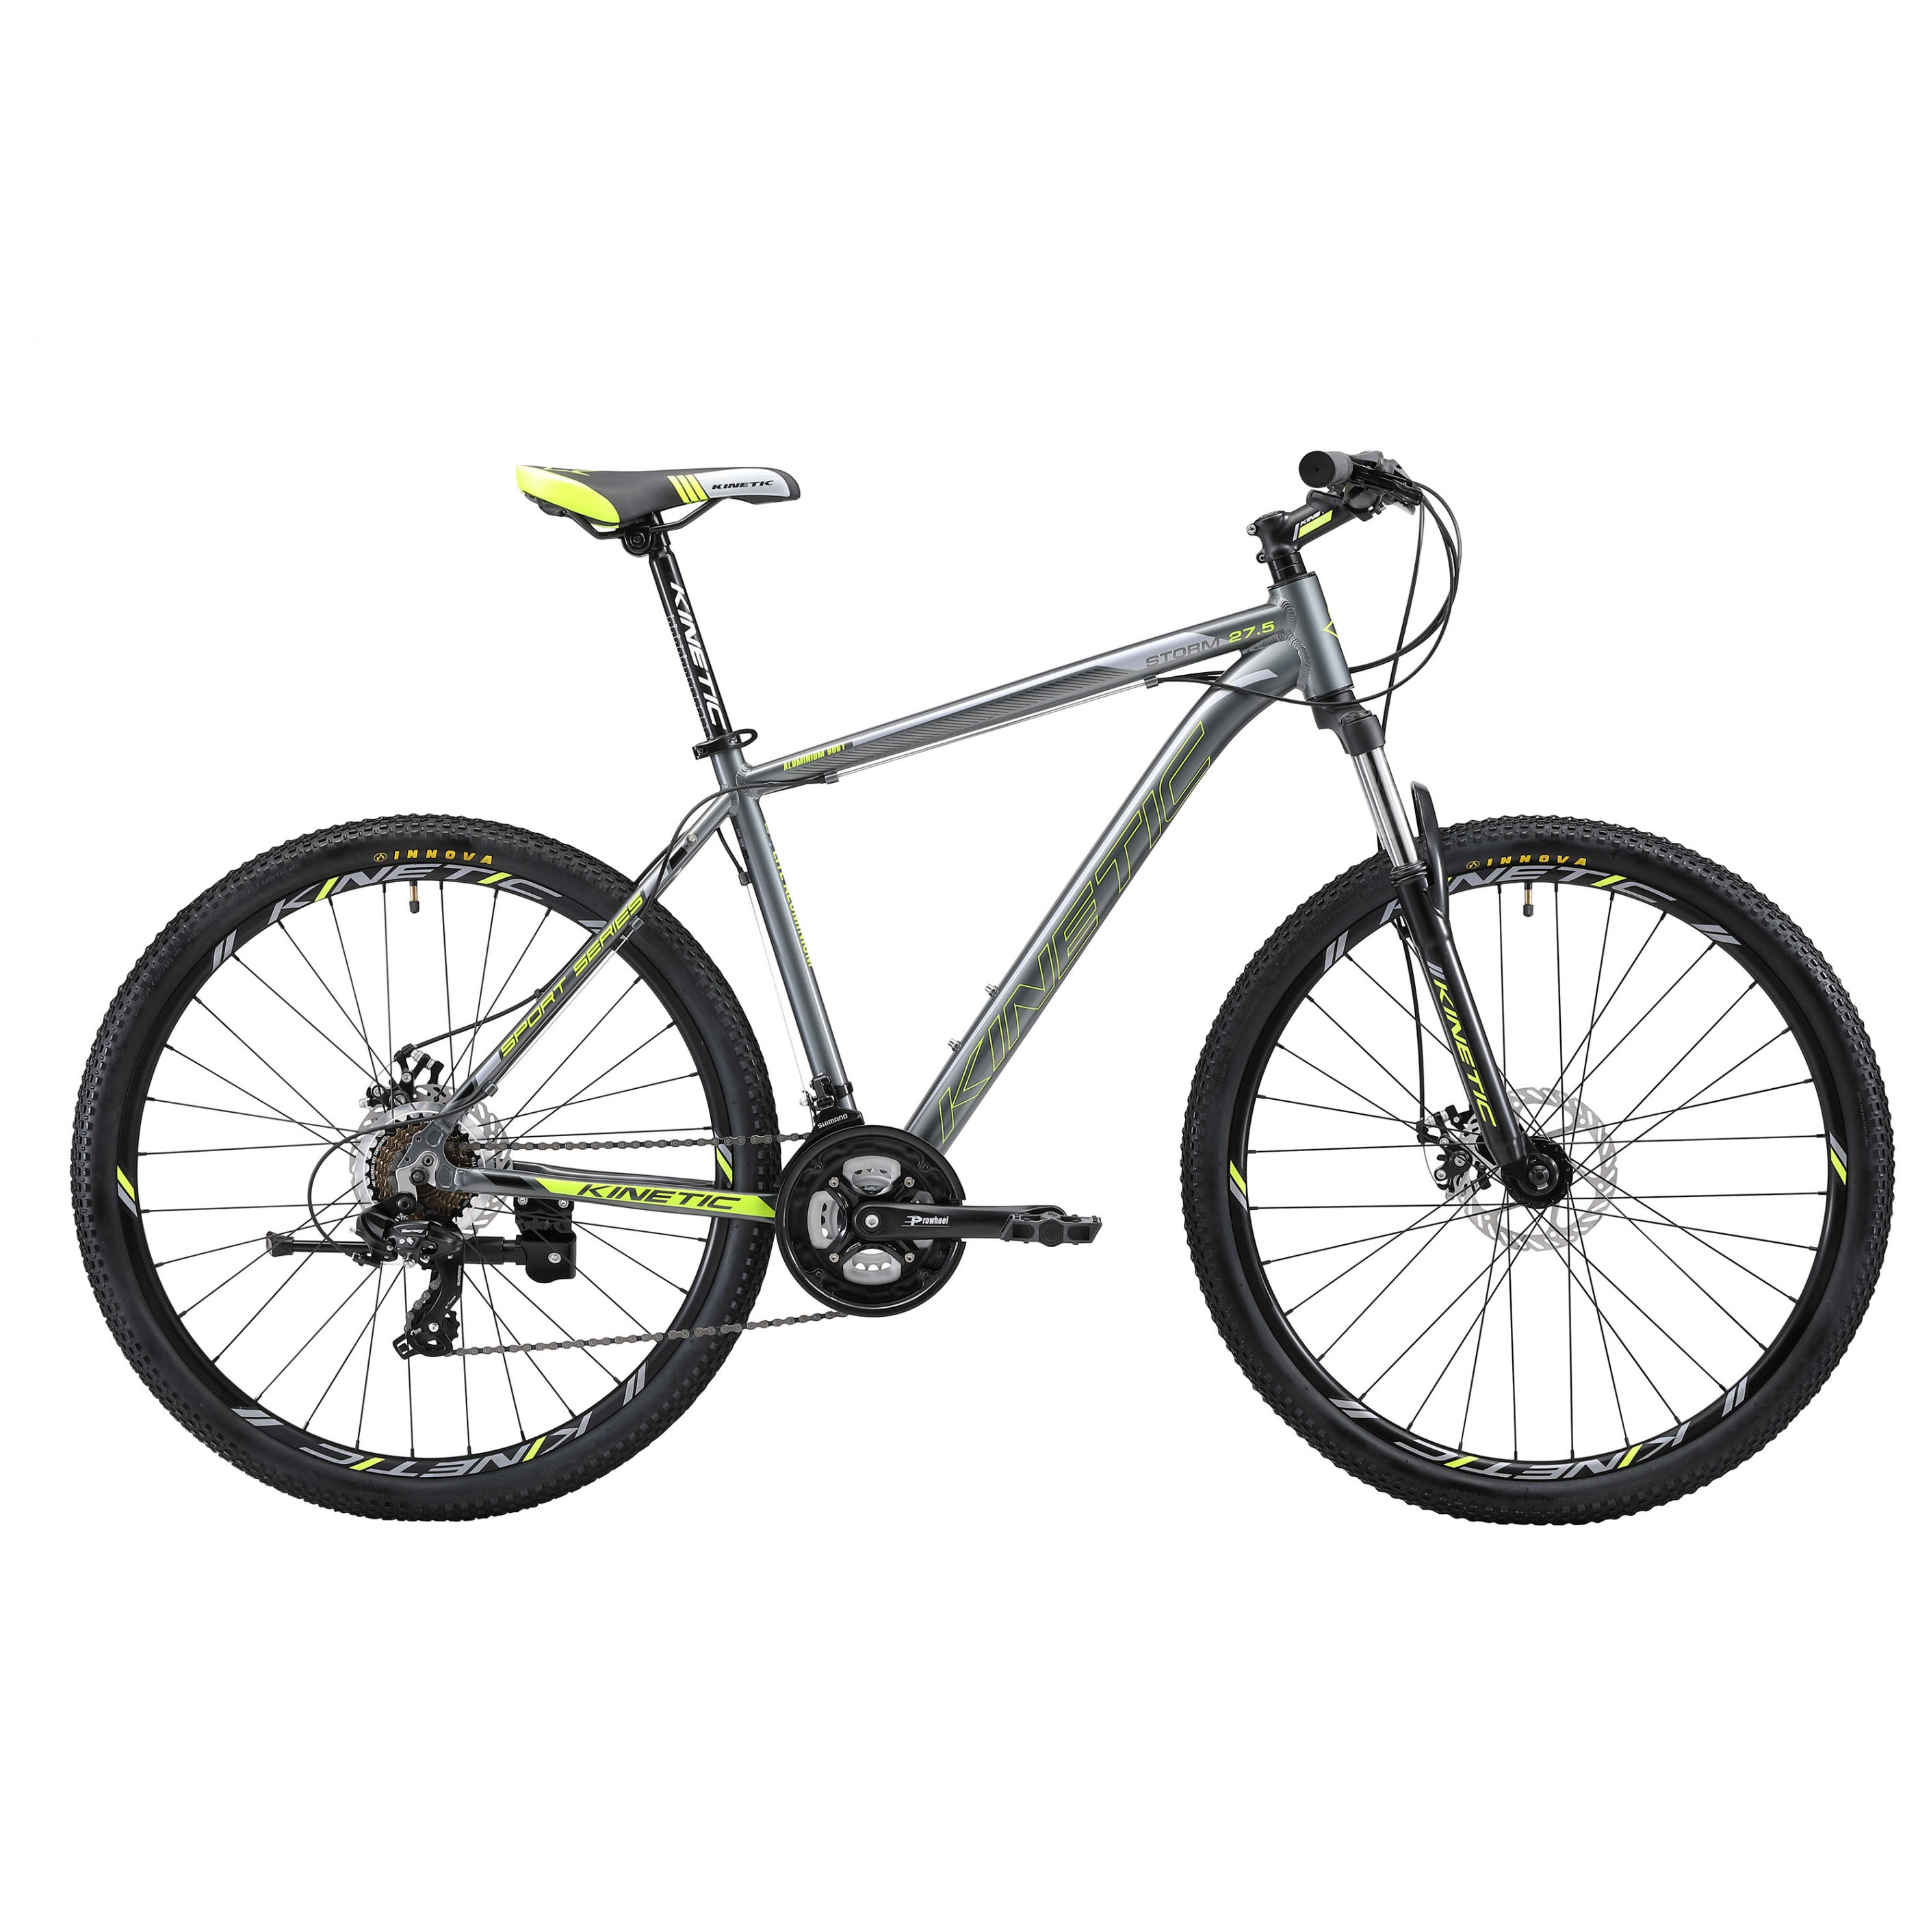 Фото Горный Велосипед Kinetic 27,5″ STORM  17″ (серо-зел)